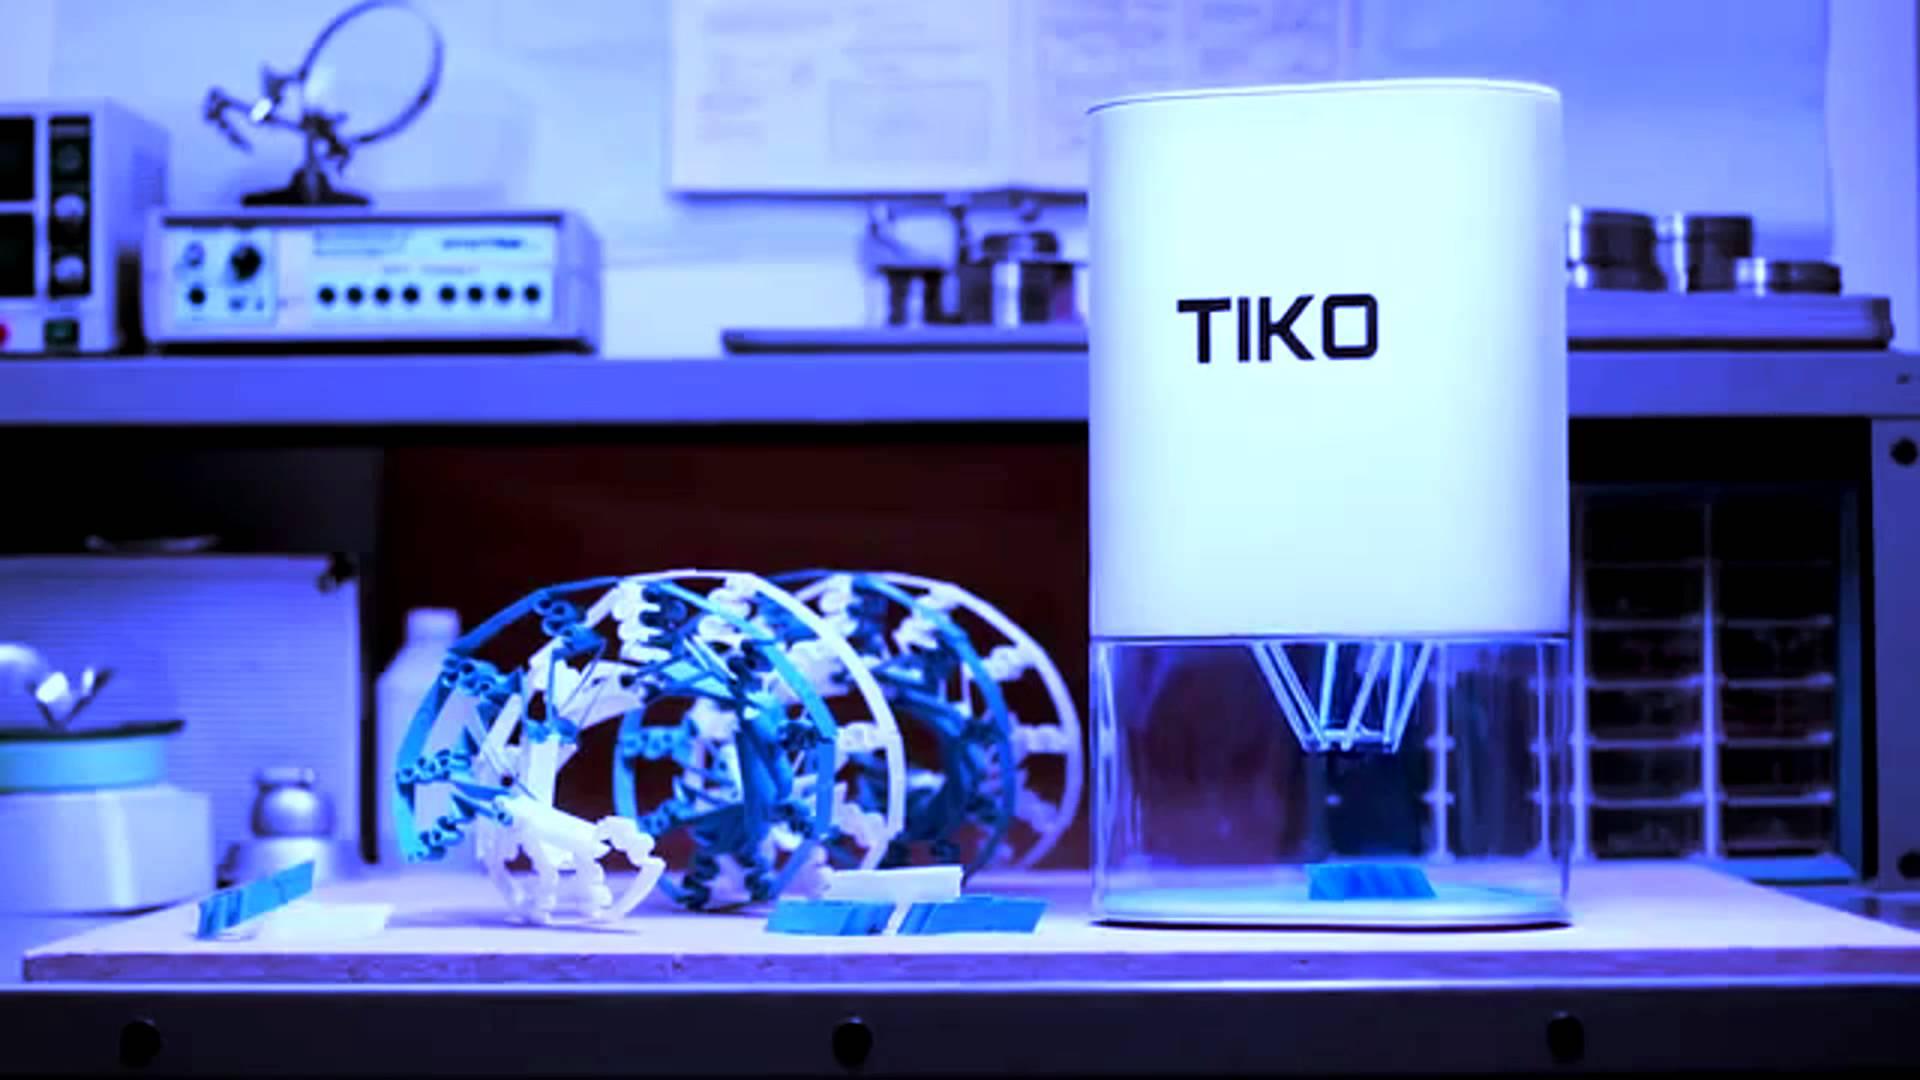 TIKO 3Dプリンター開発プロジェクトが中止と発表